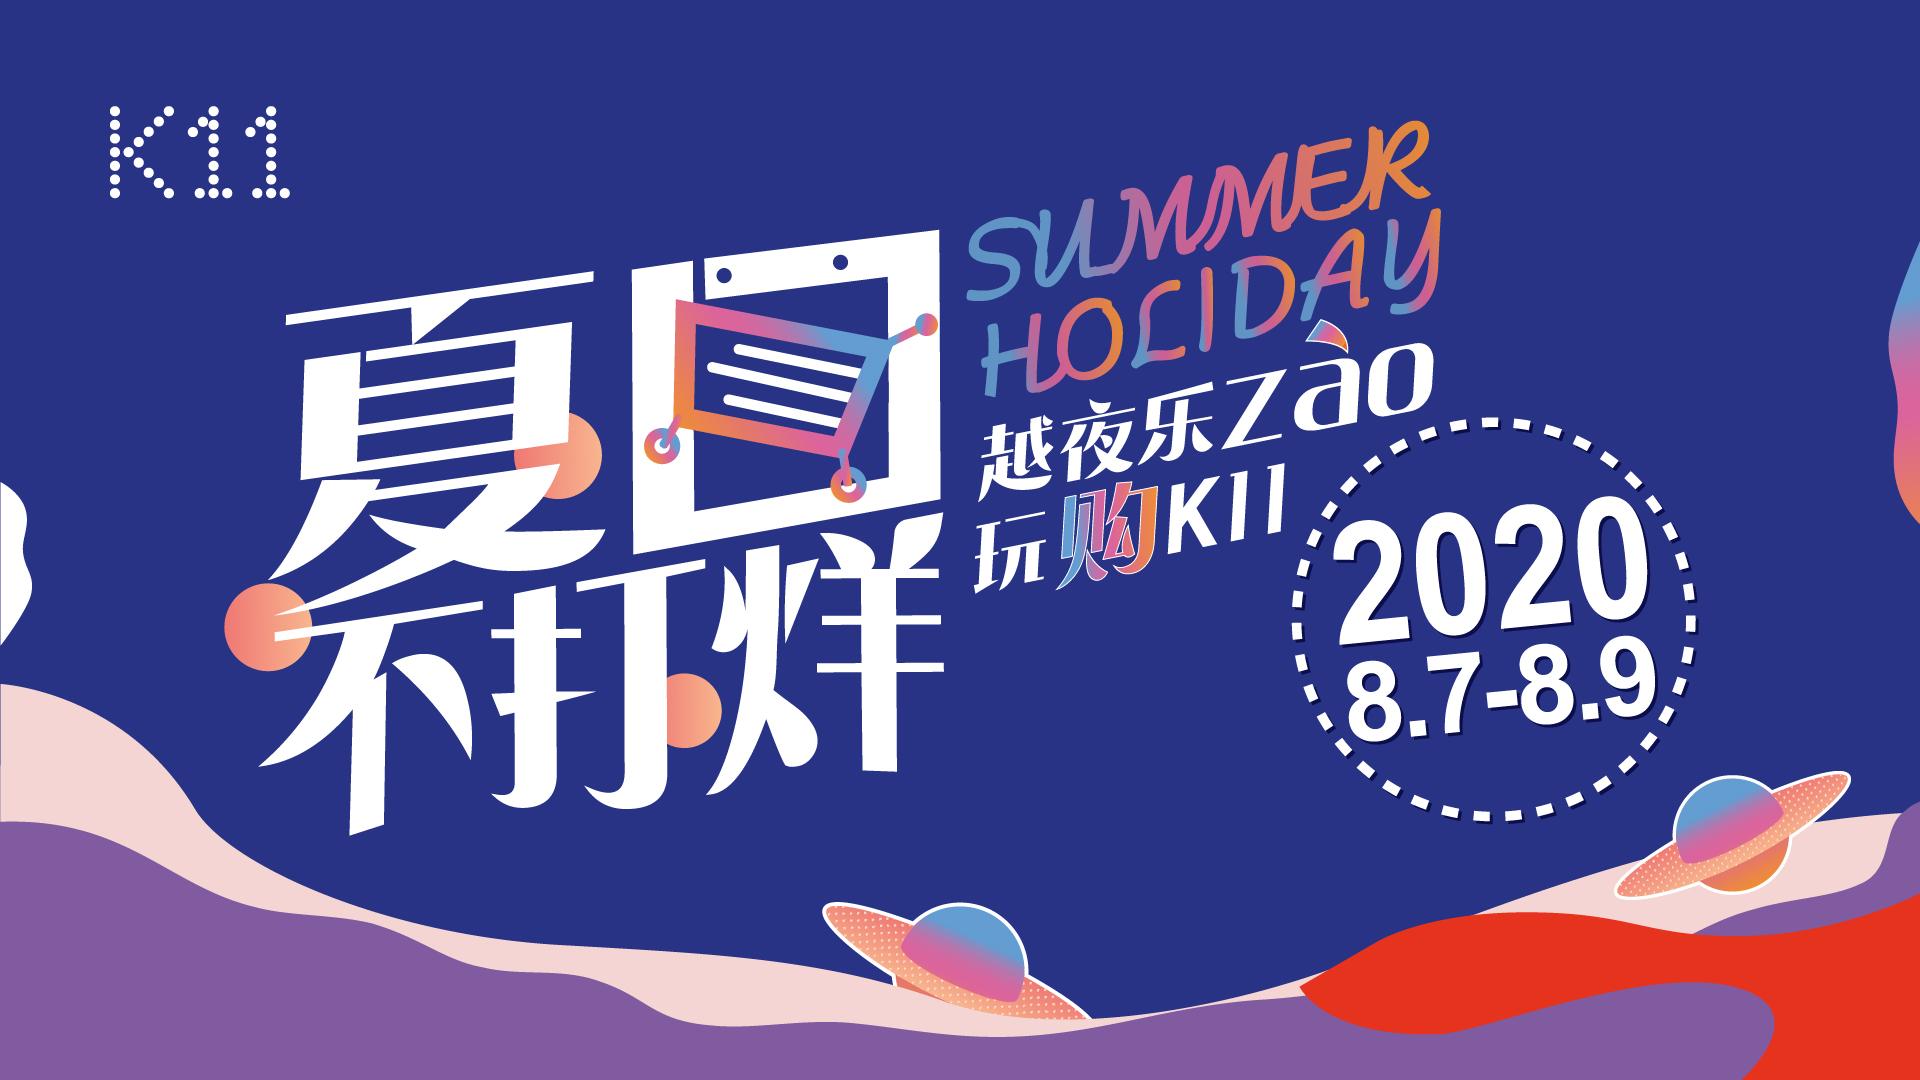 K11 Summer holiday 夏日不打烊